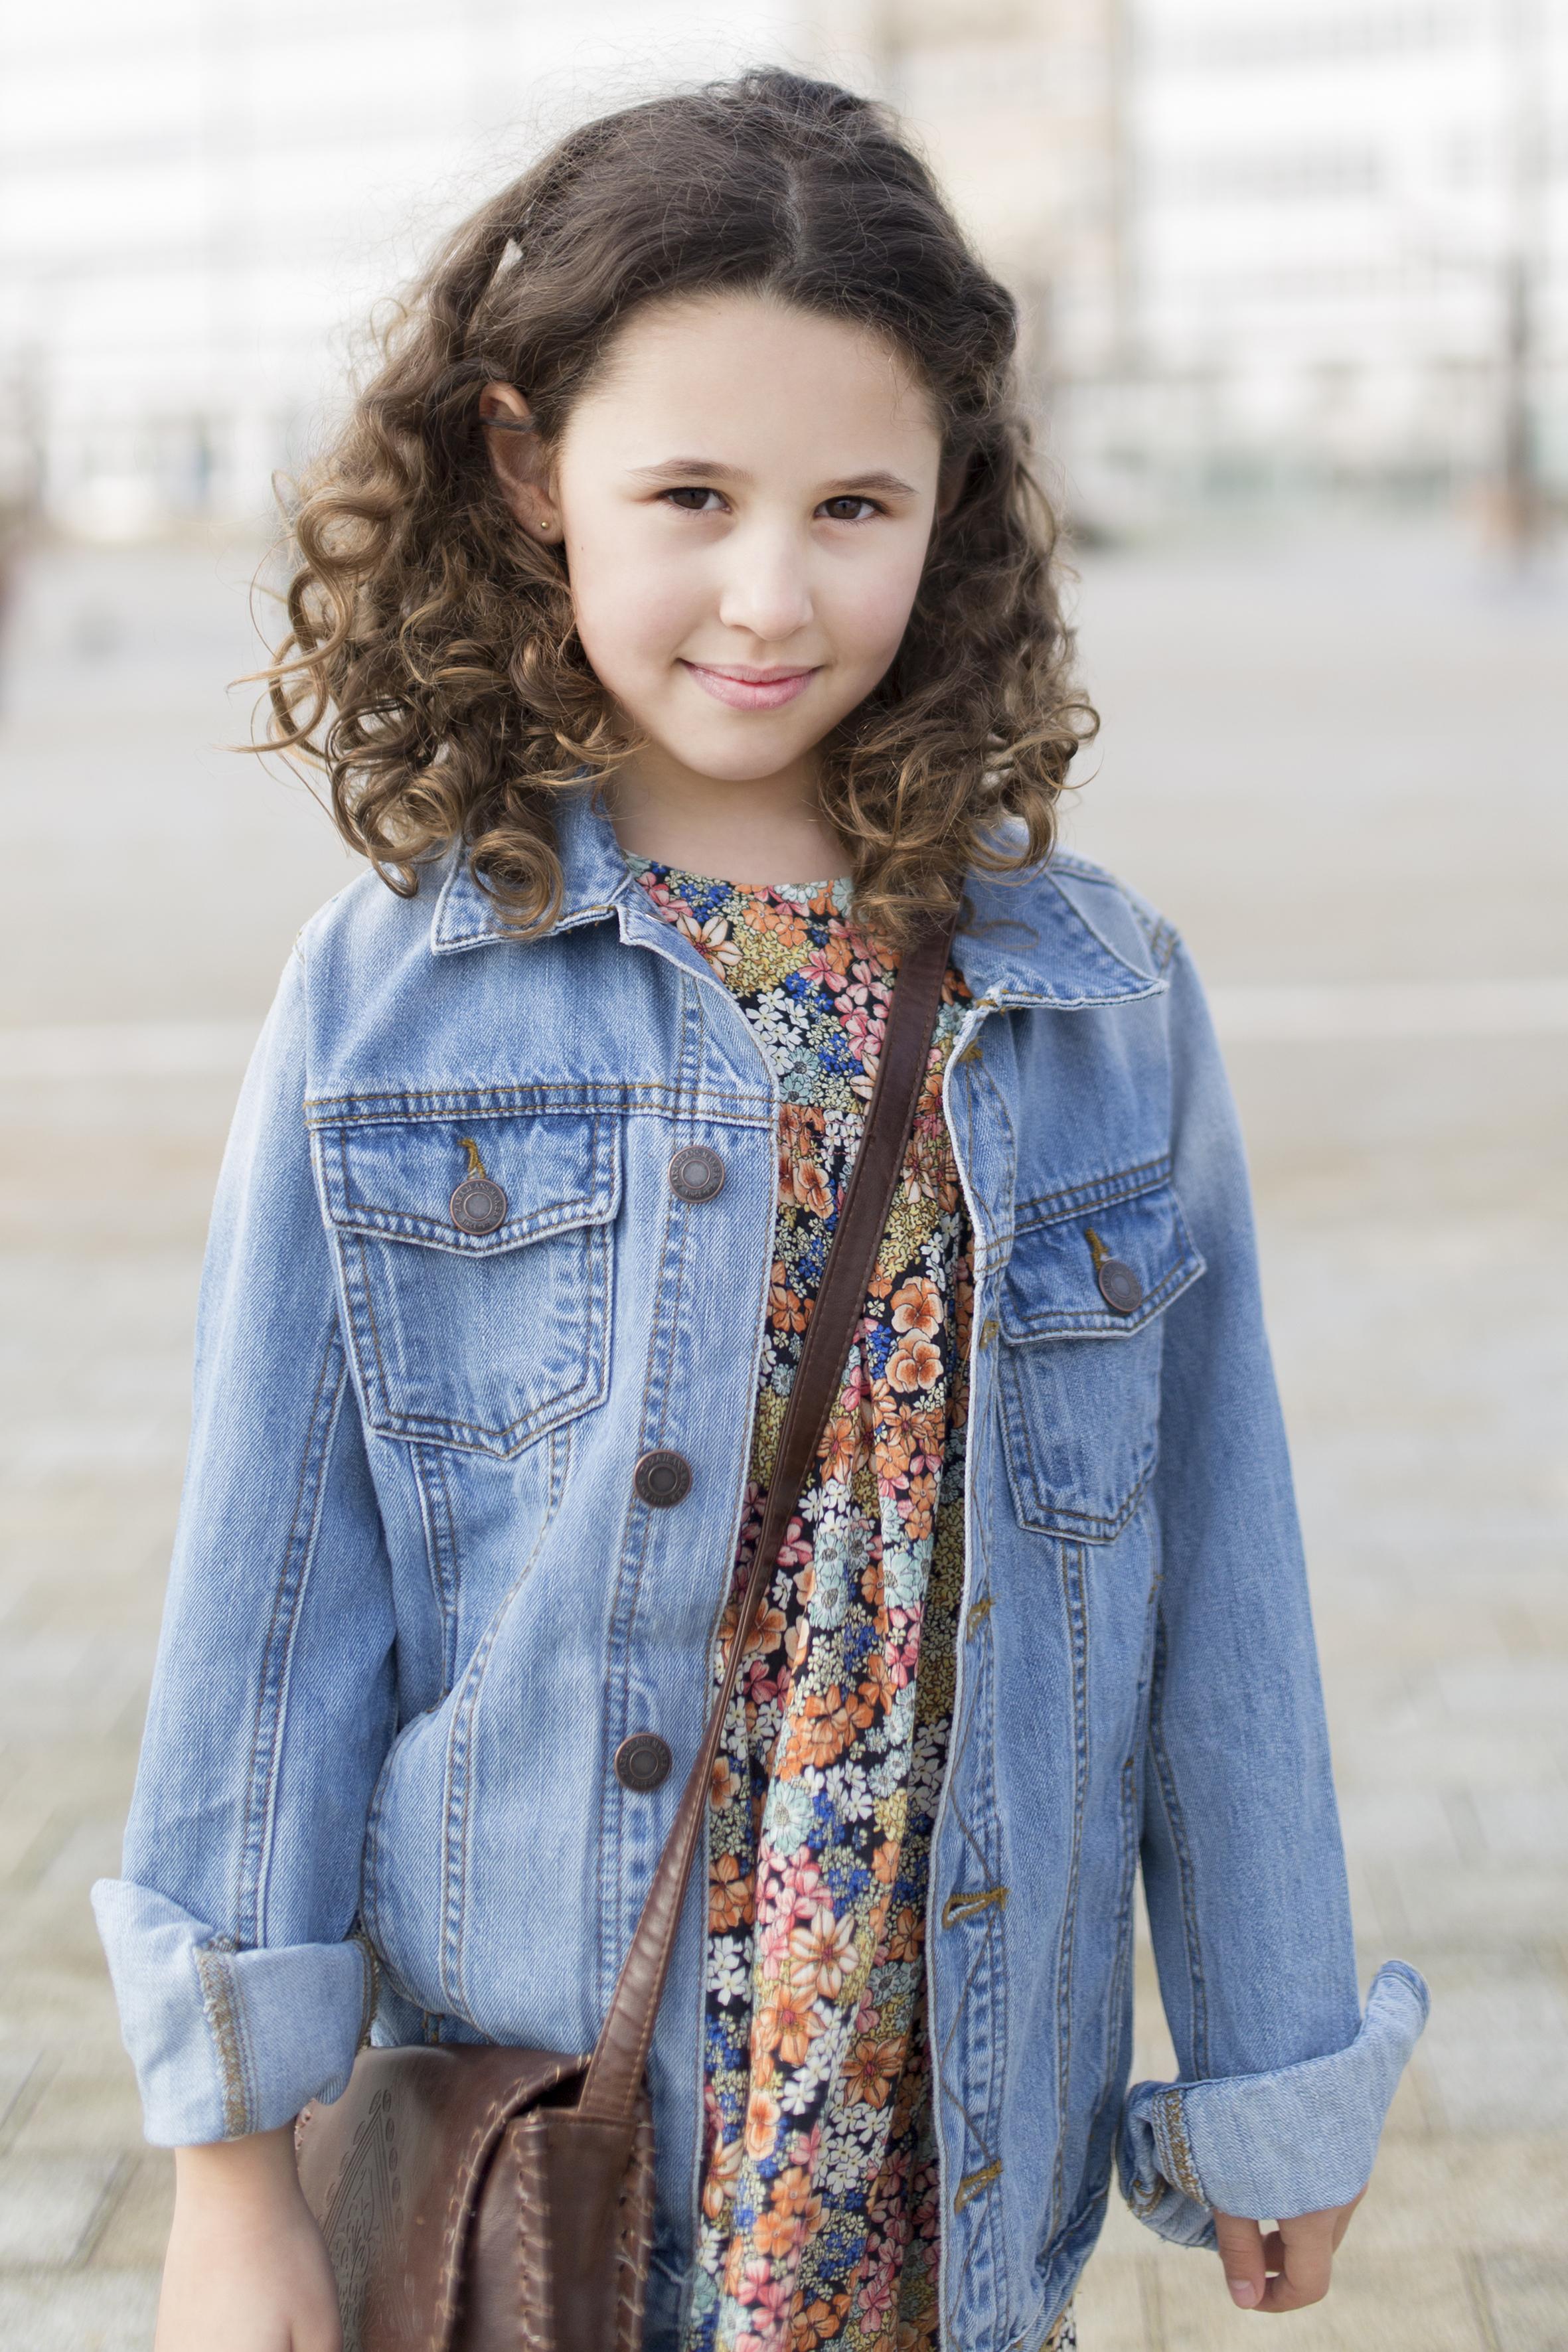 coruña-niños-jimena-zara kids-denim jacket-My partner-fashion-moda-street style-descalzaporelparque-blogger